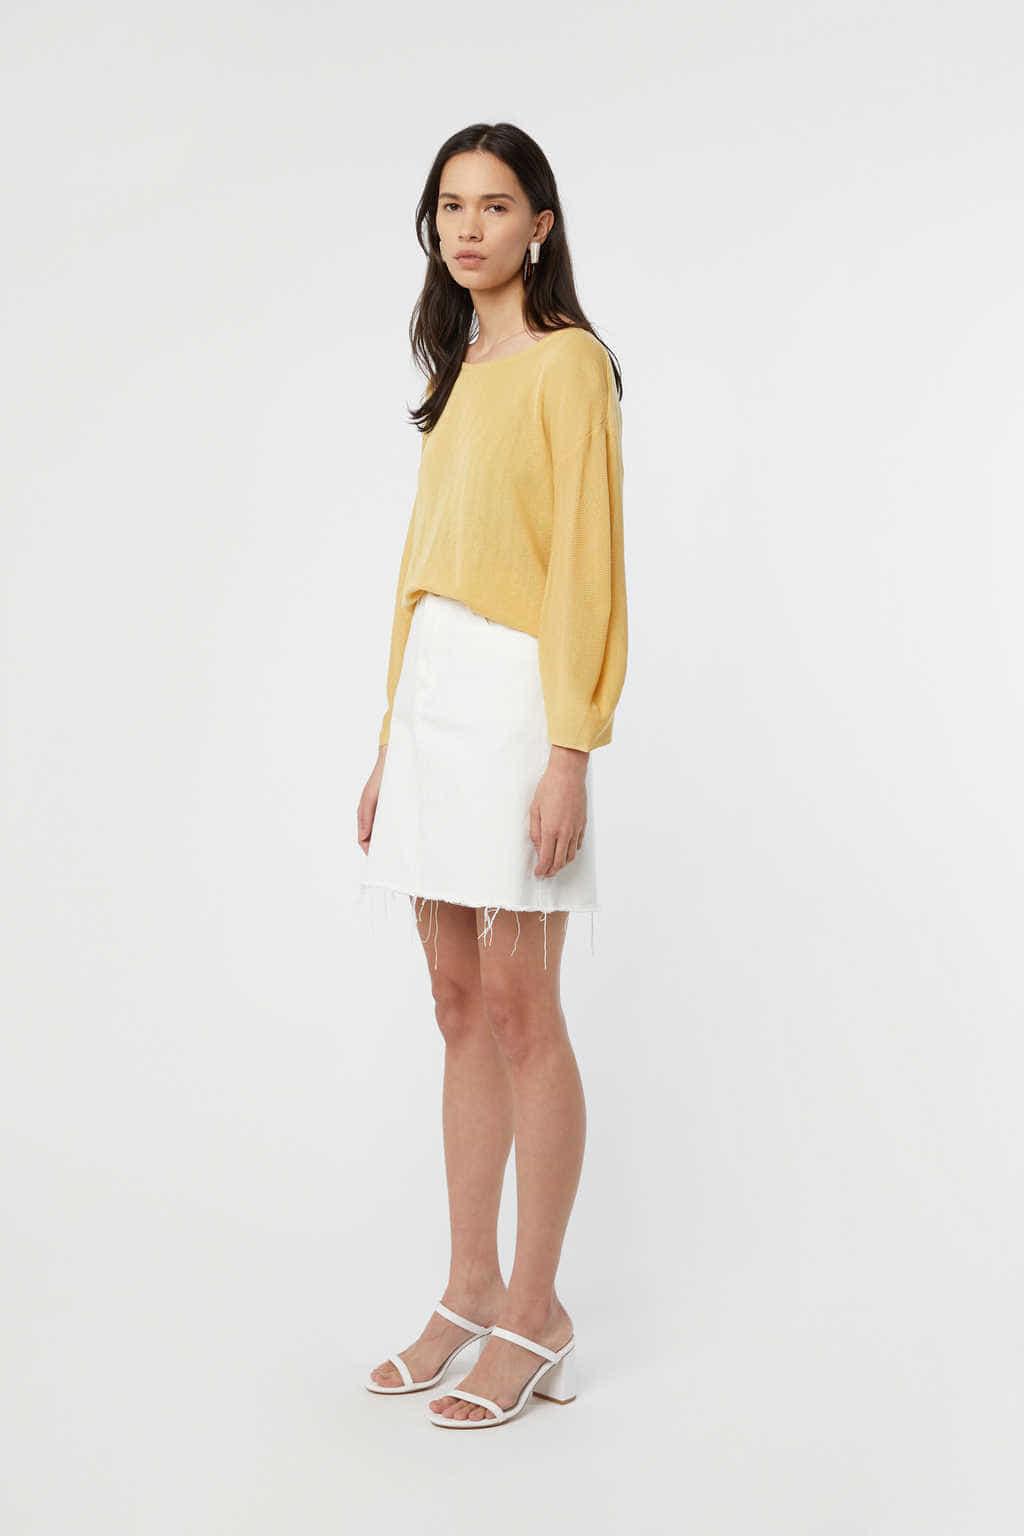 TShirt K010 Yellow 3